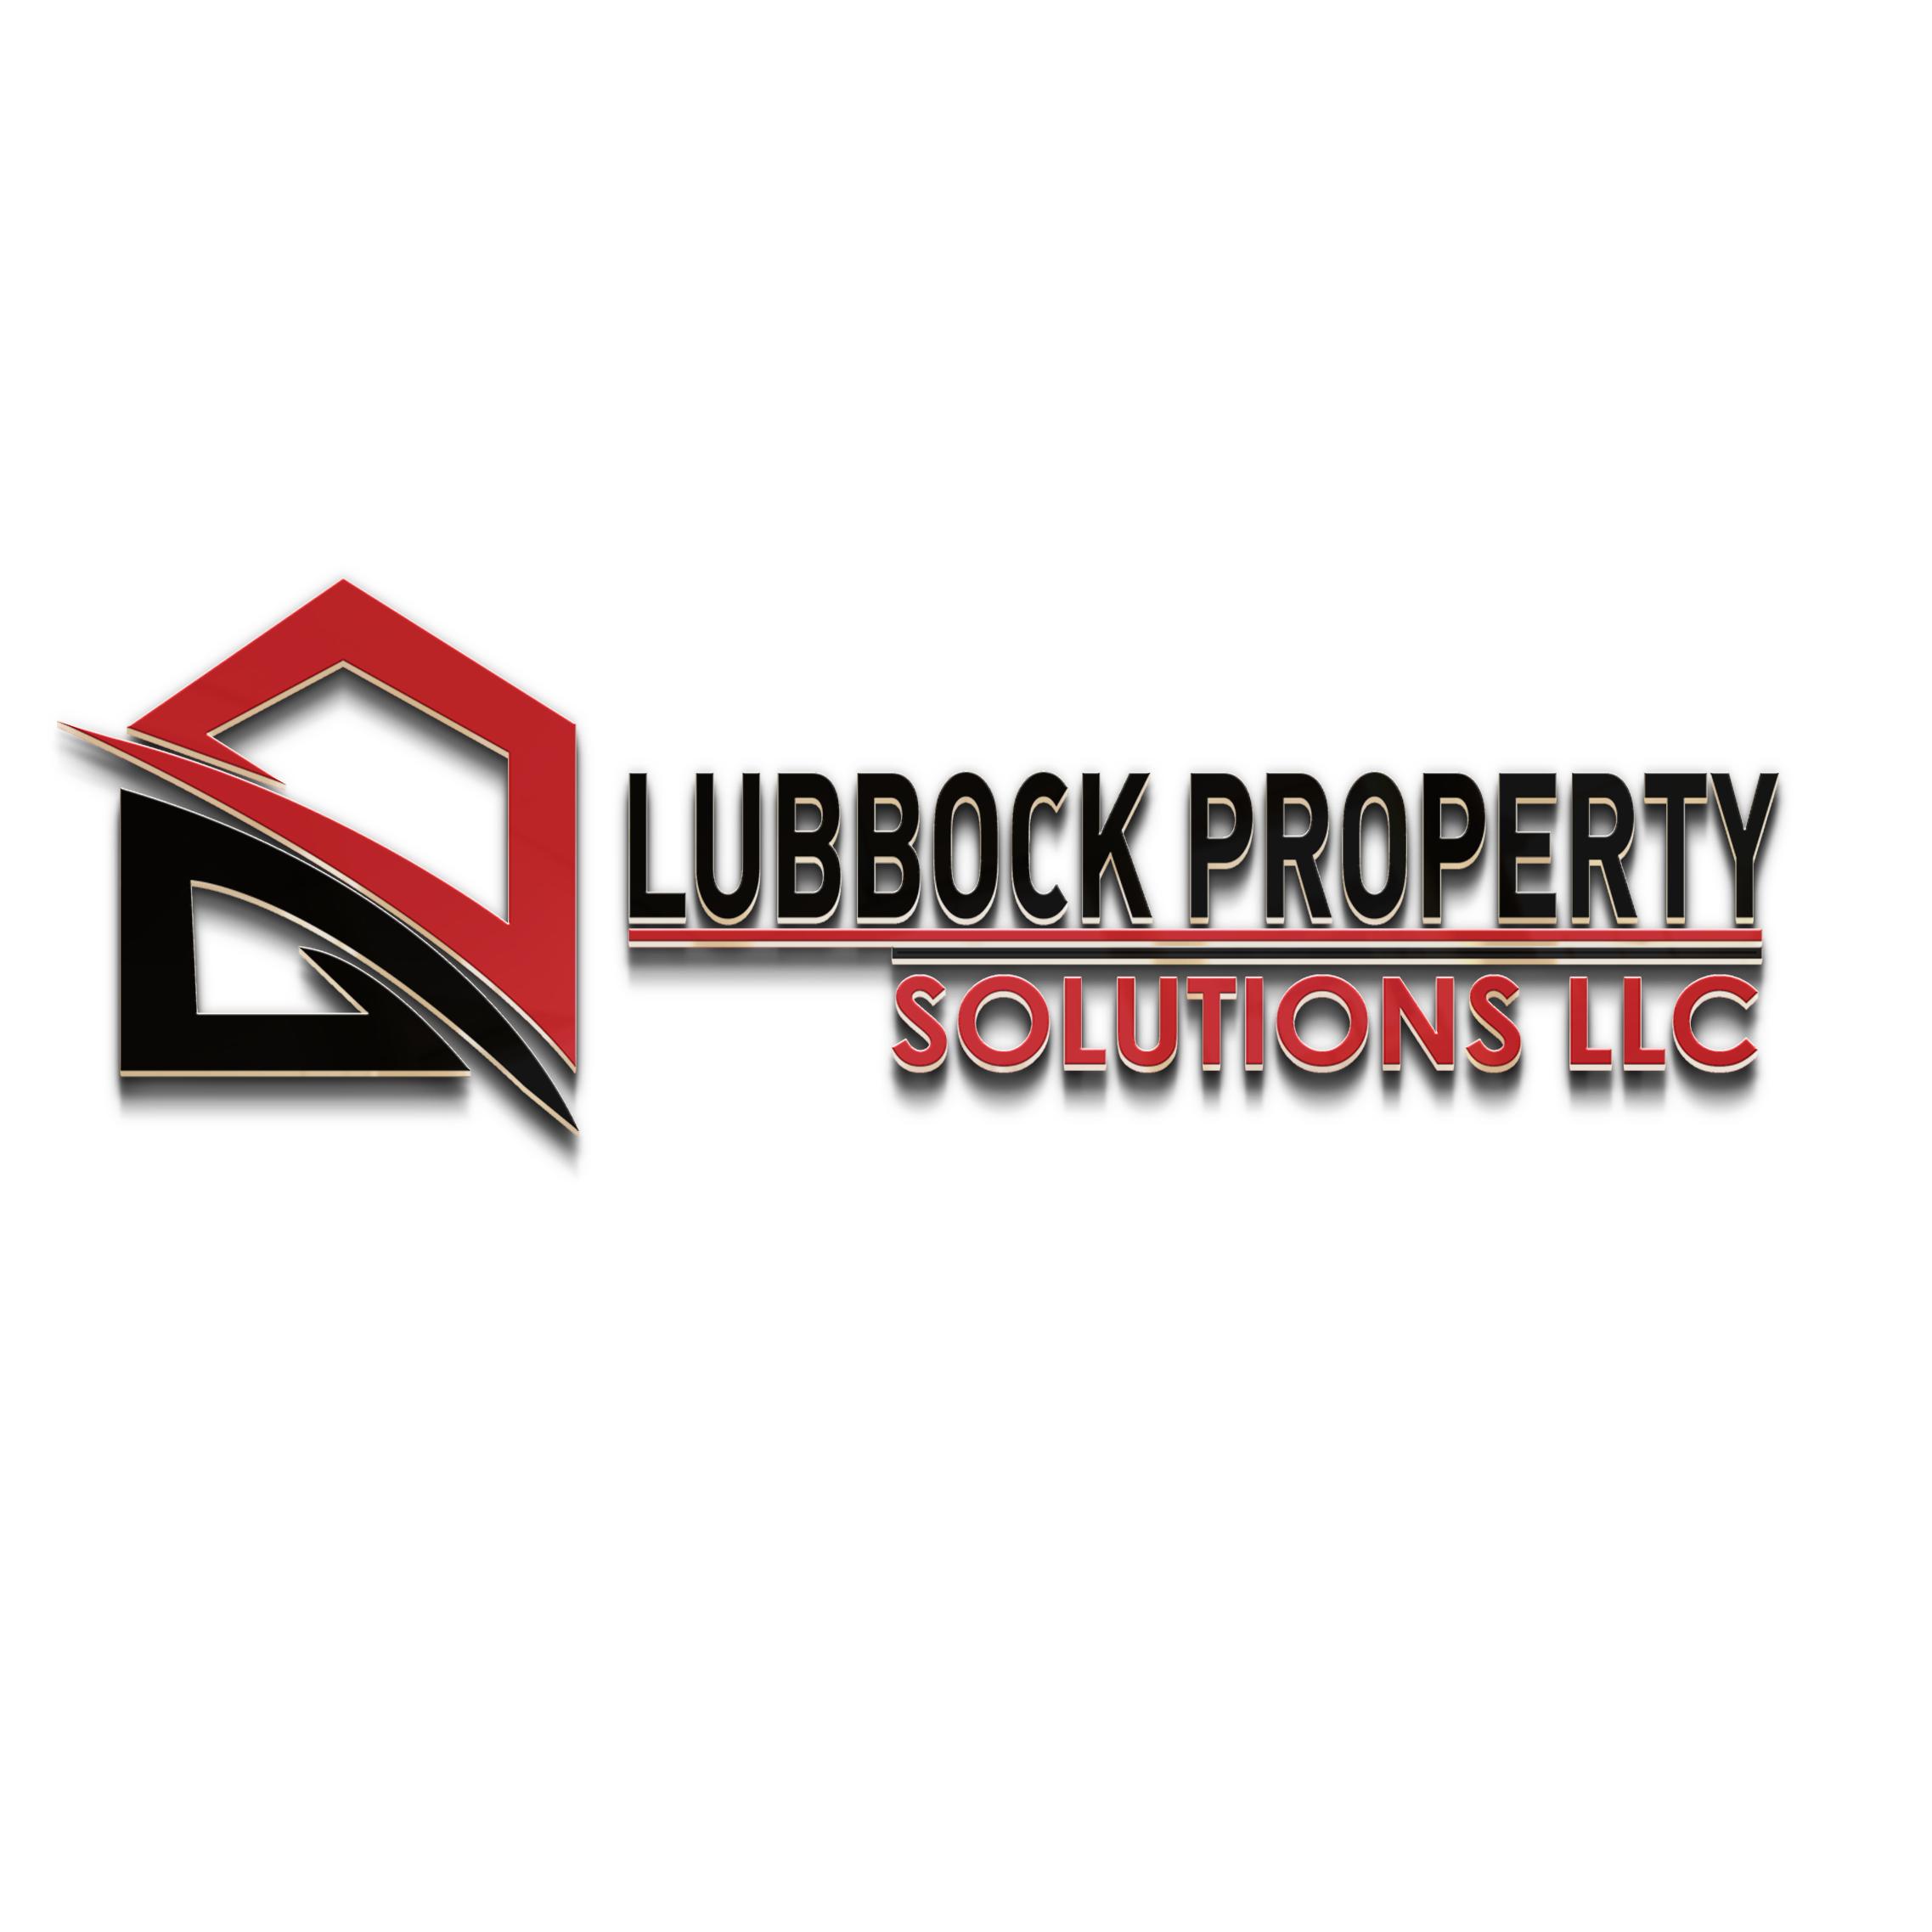 Branden Buys Lubbock Houses